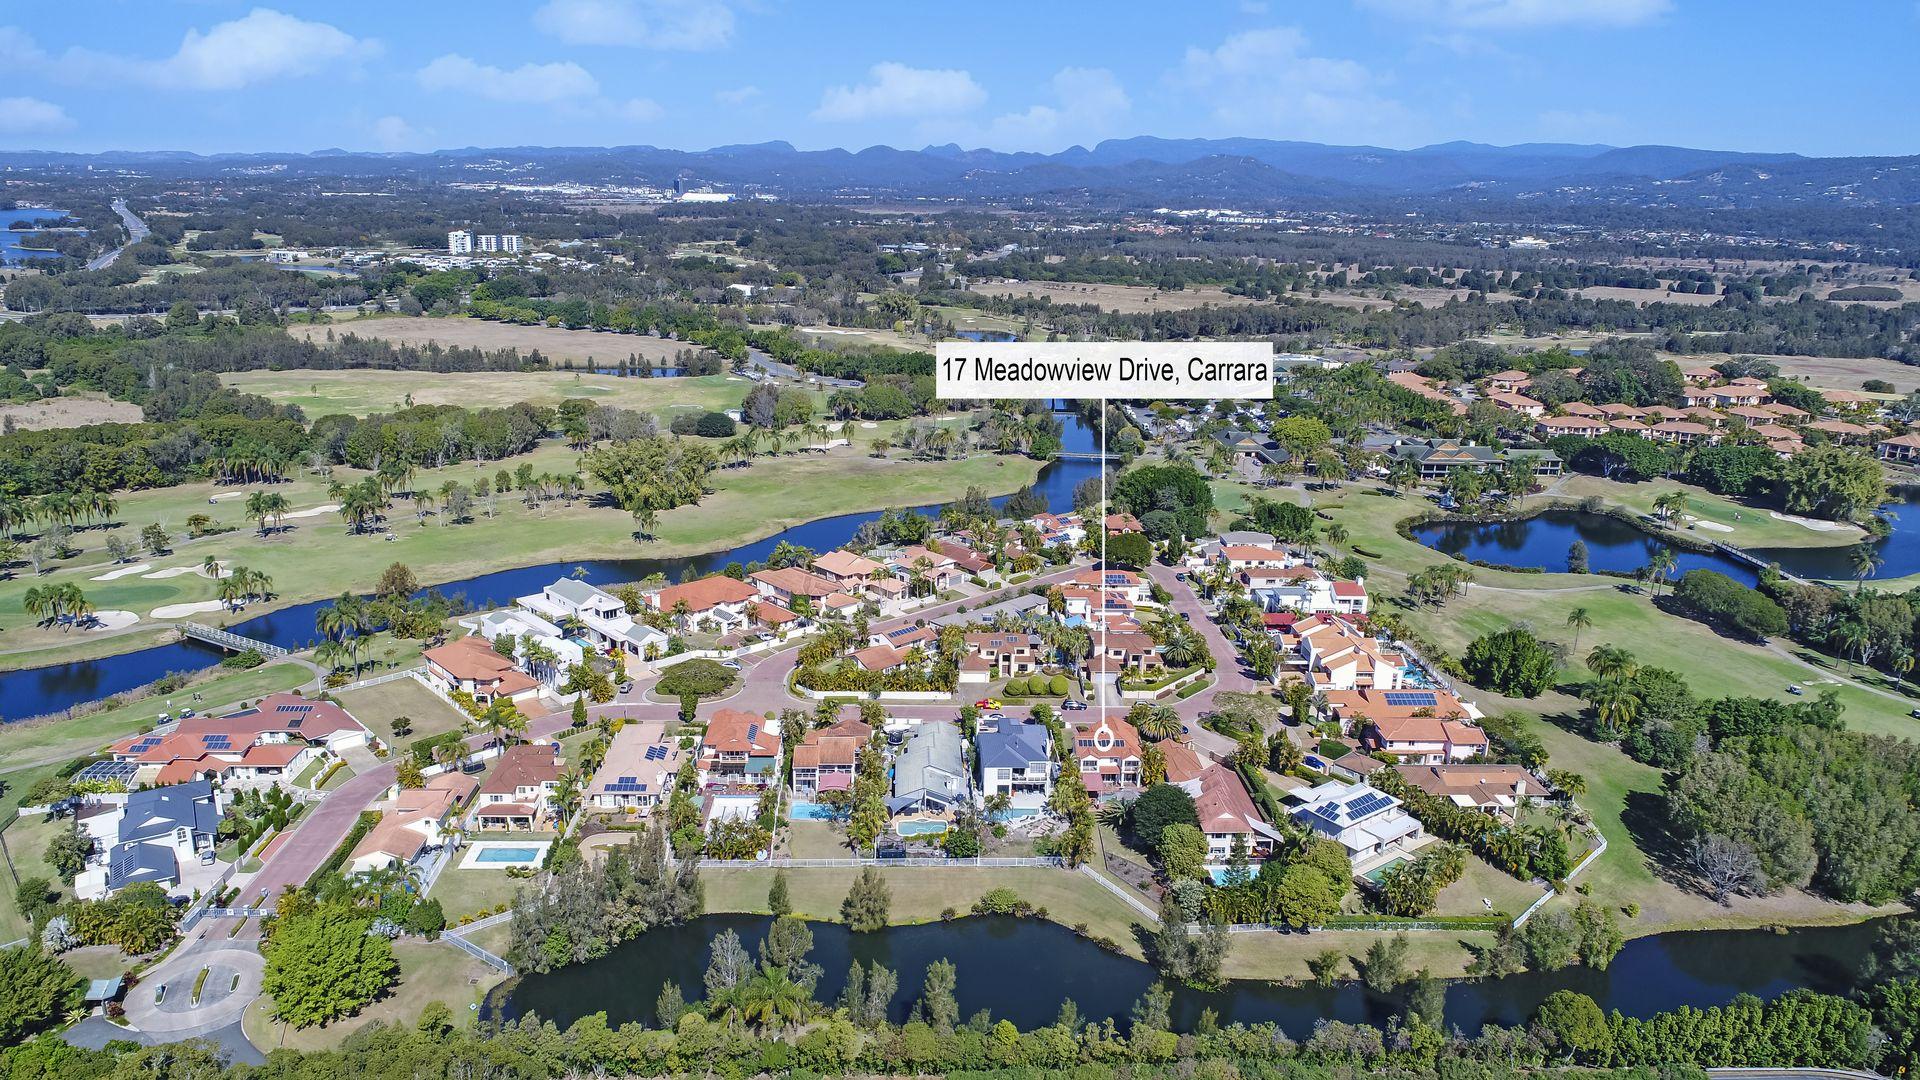 17 Meadowview Drive, Carrara QLD 4211, Image 0